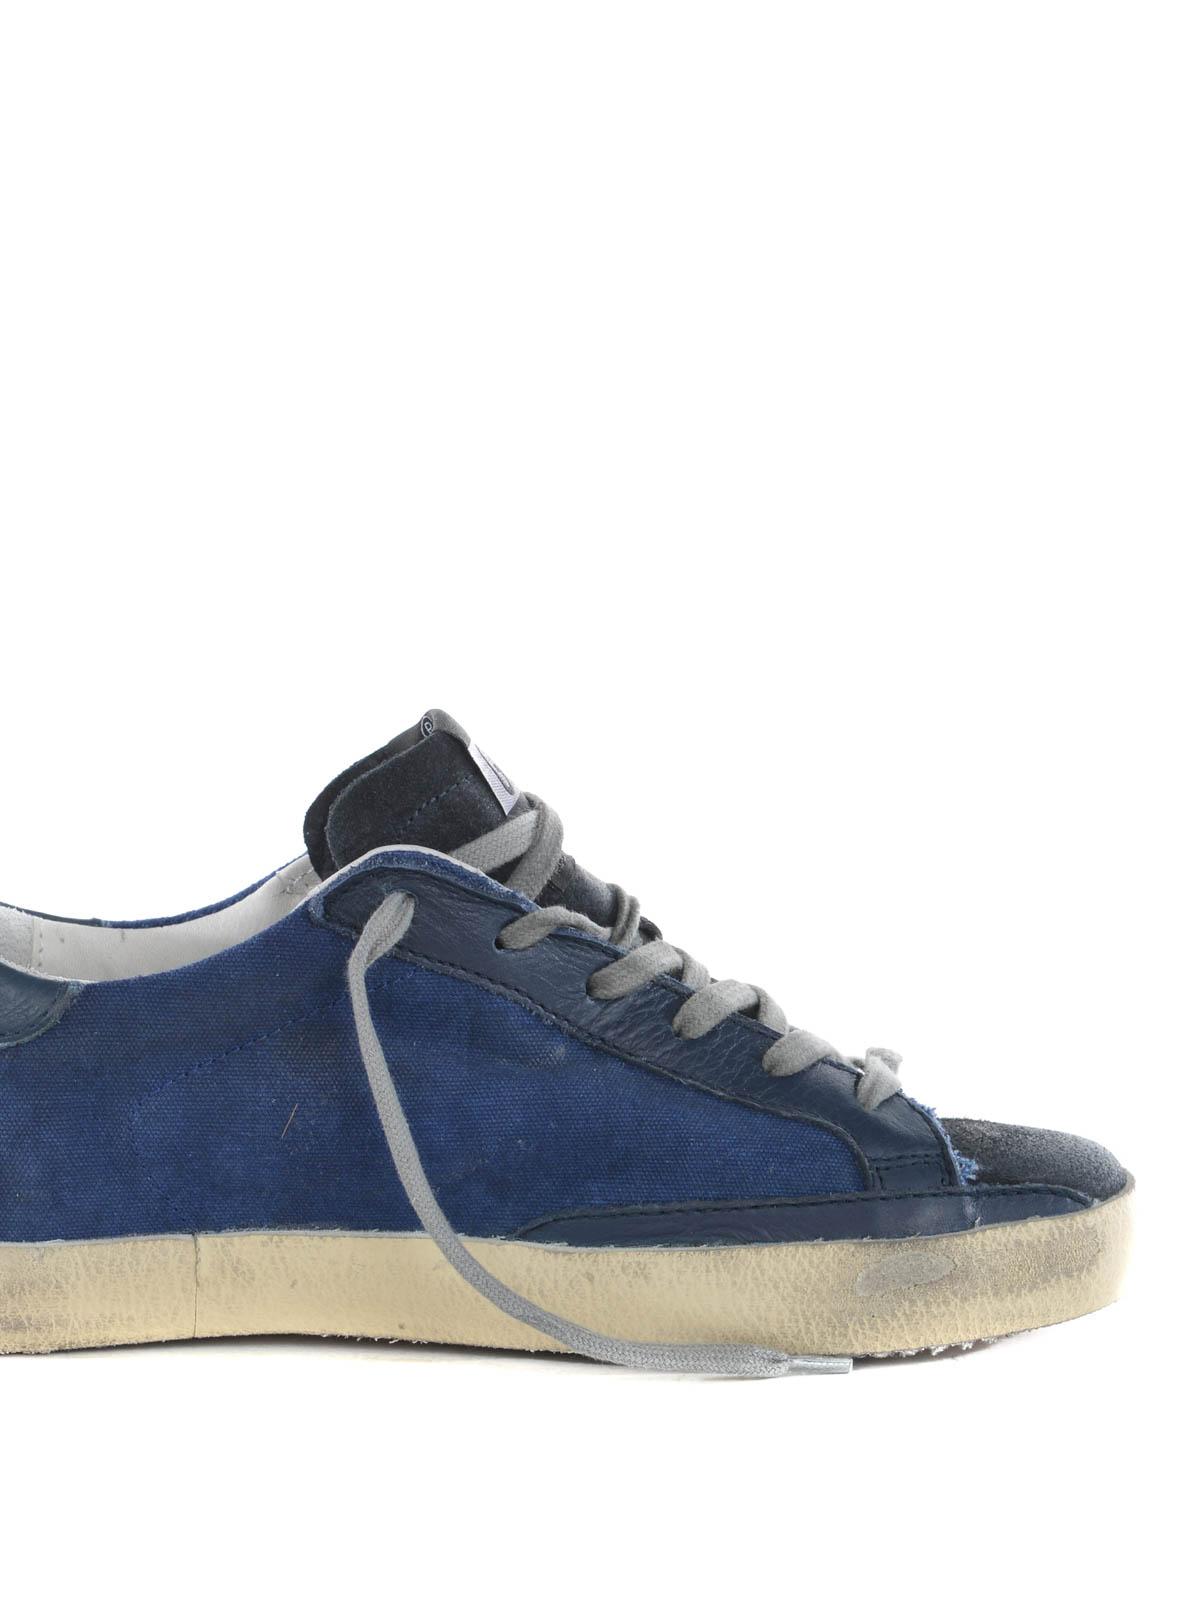 super star denim sneakers by golden goose trainers ikrix. Black Bedroom Furniture Sets. Home Design Ideas